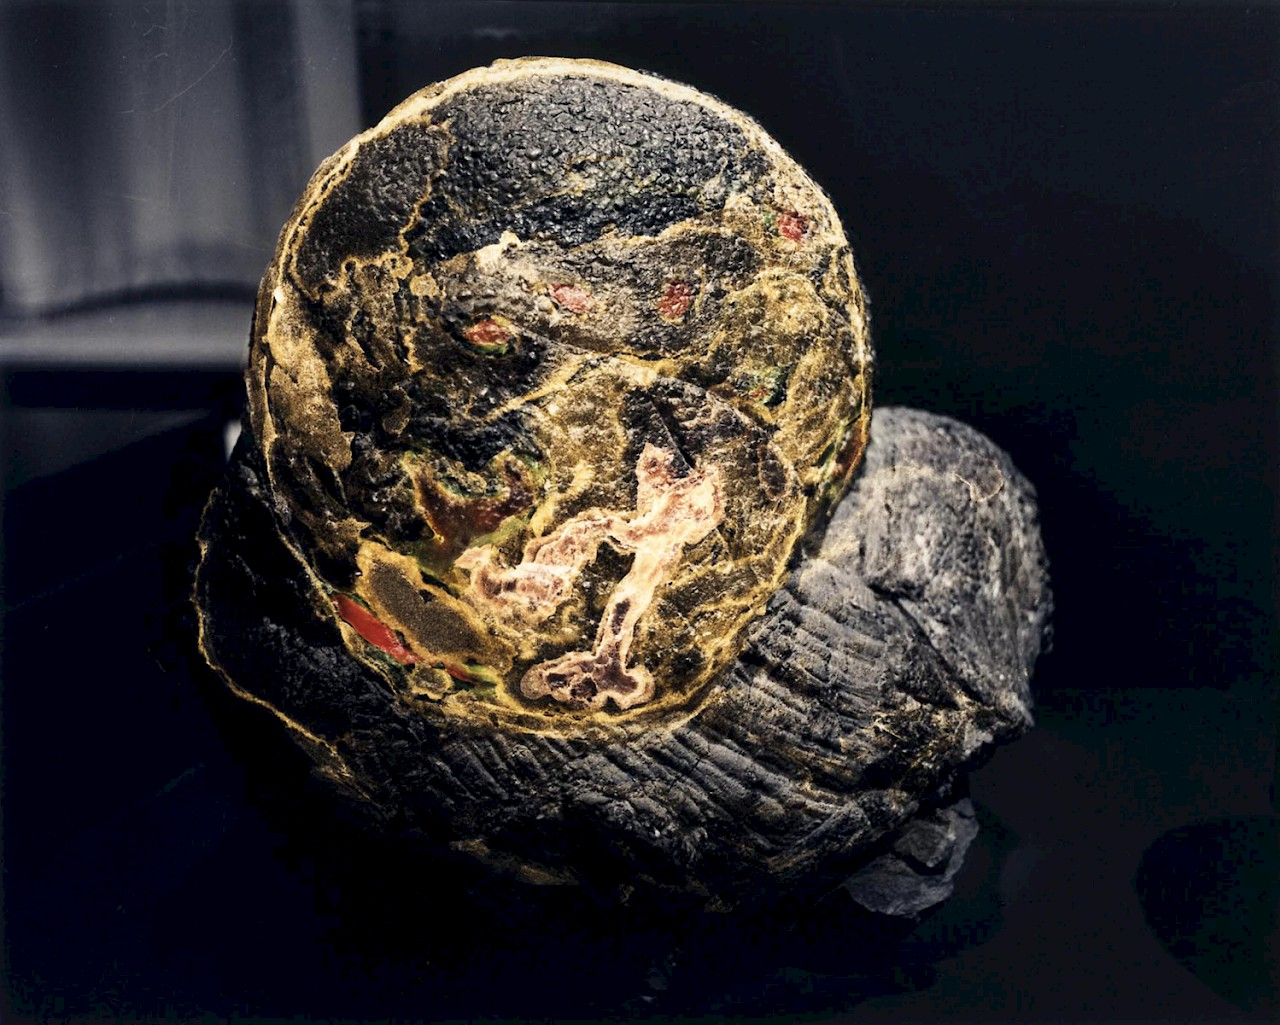 Hanna Mattes Meteorite 2013